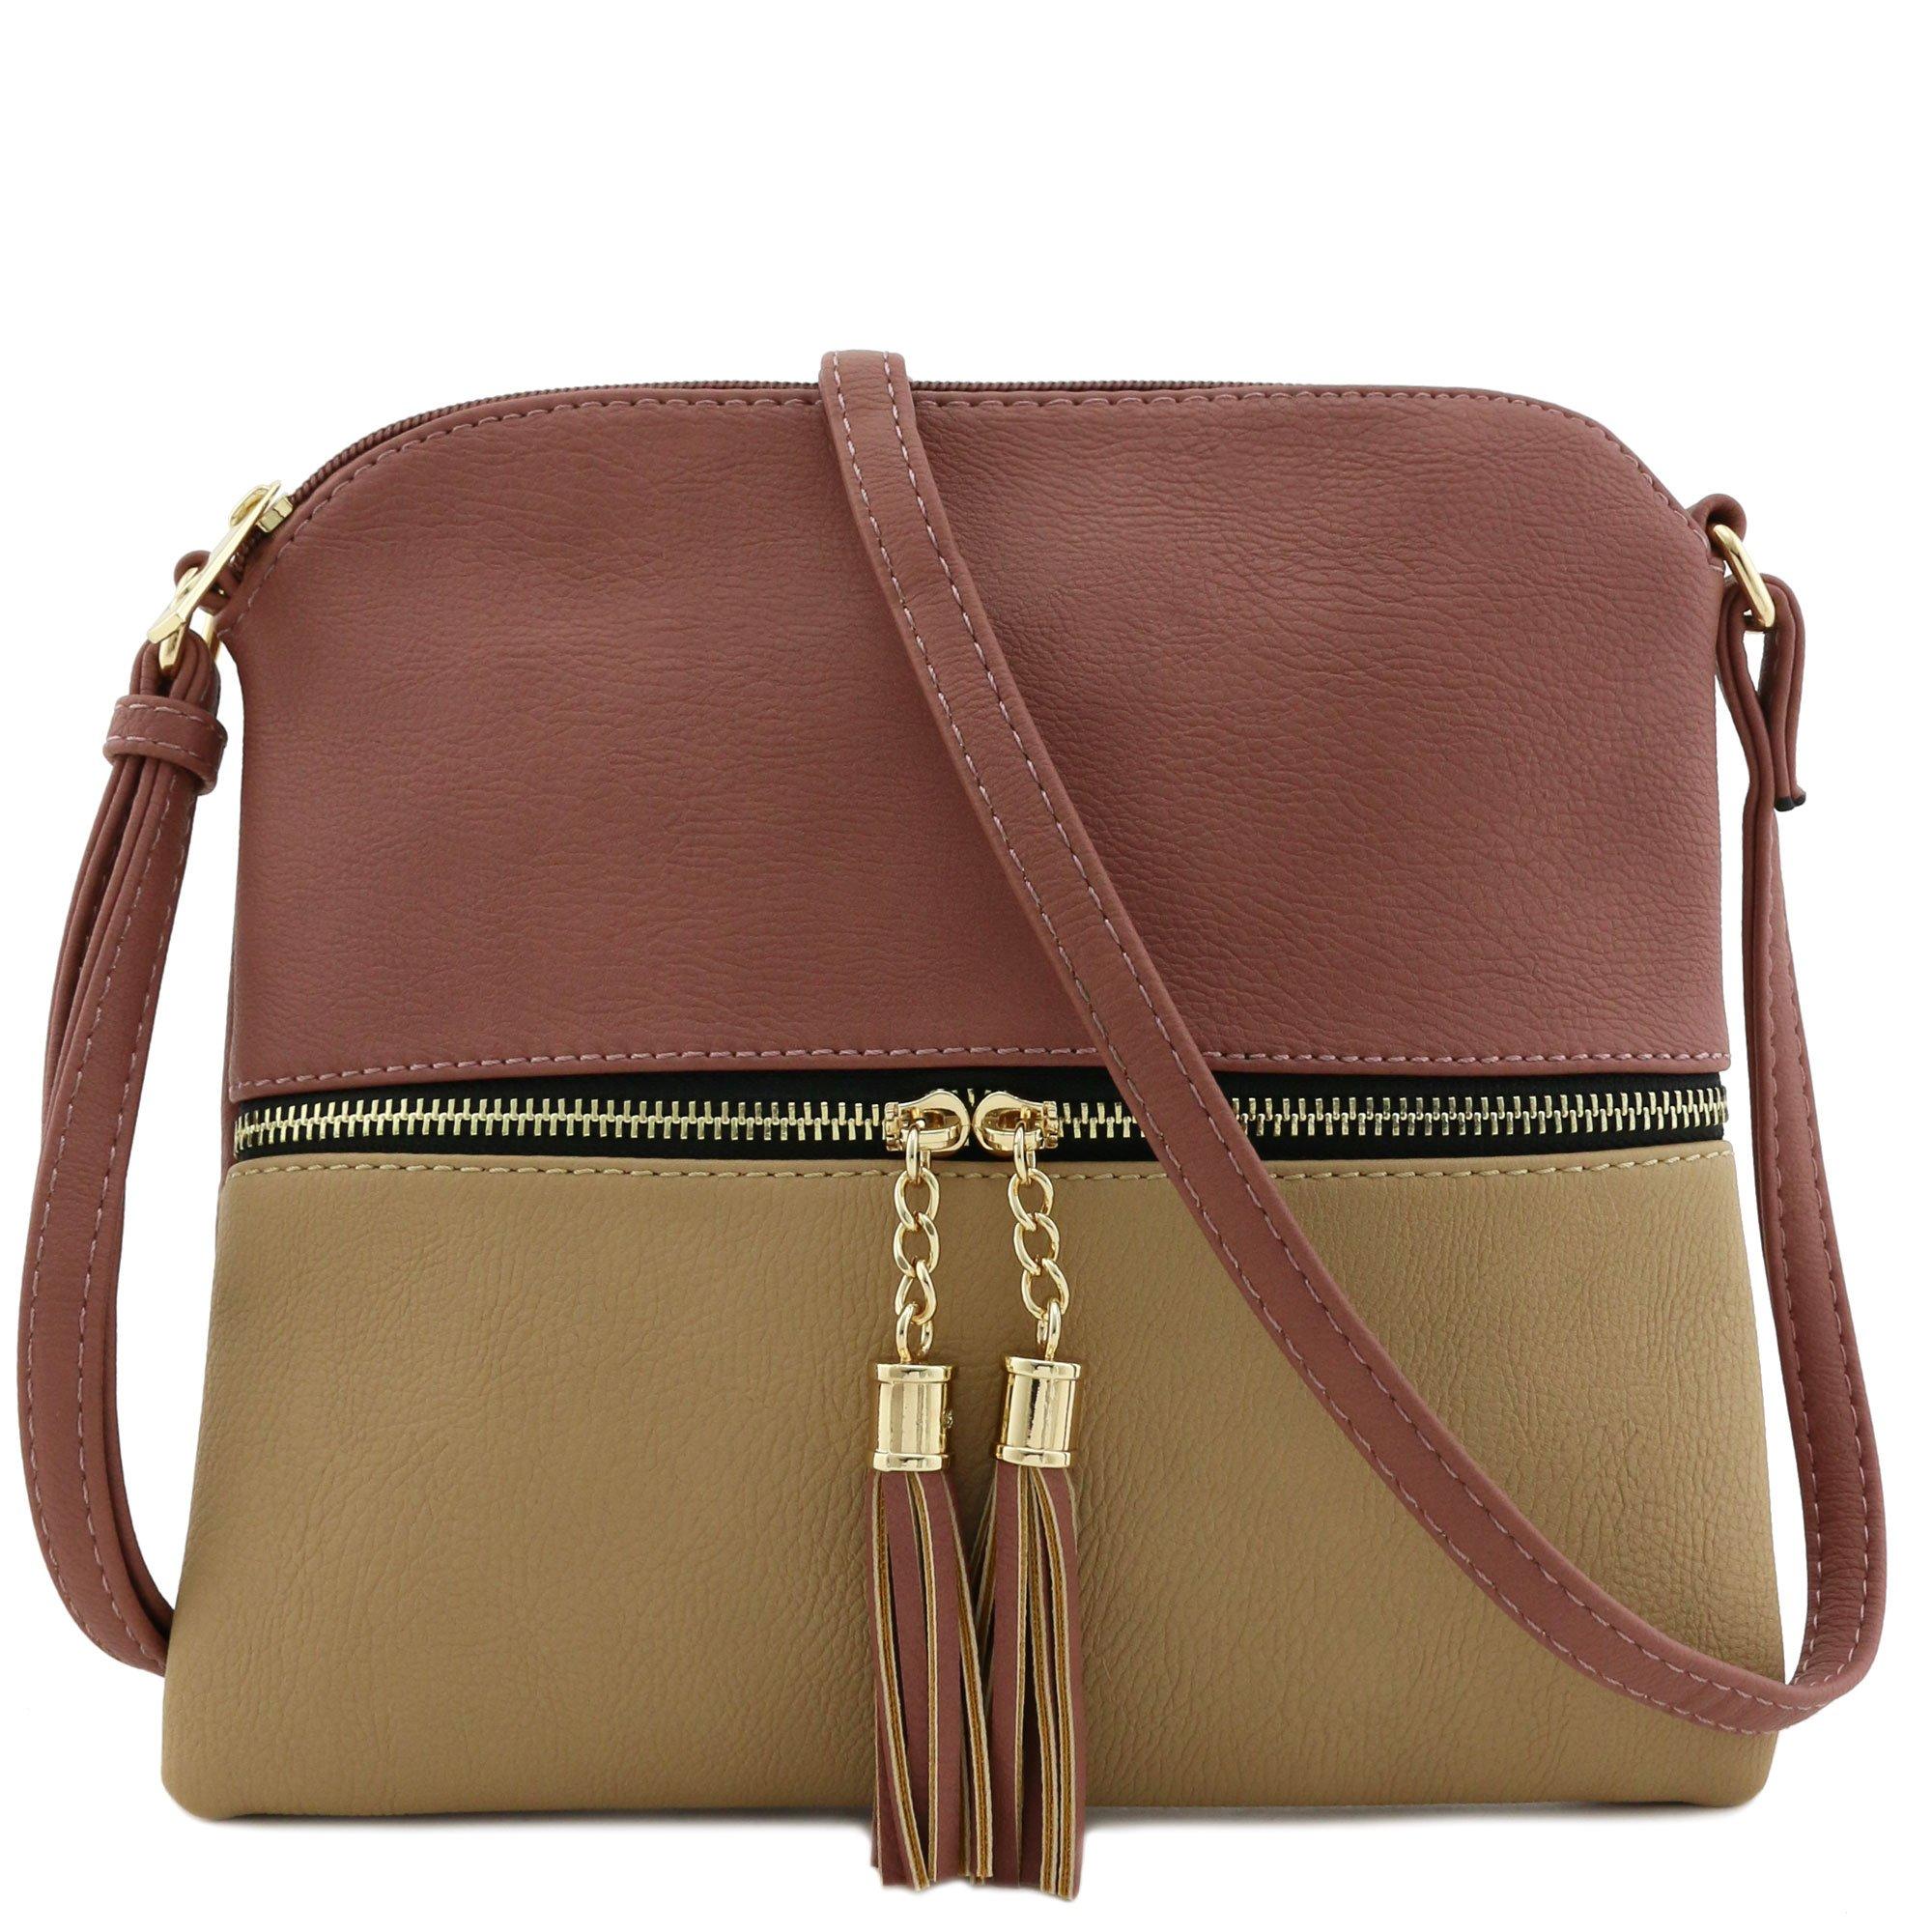 Lightweight Medium Crossbody Bag with Tassel (Mauve/Taupe)